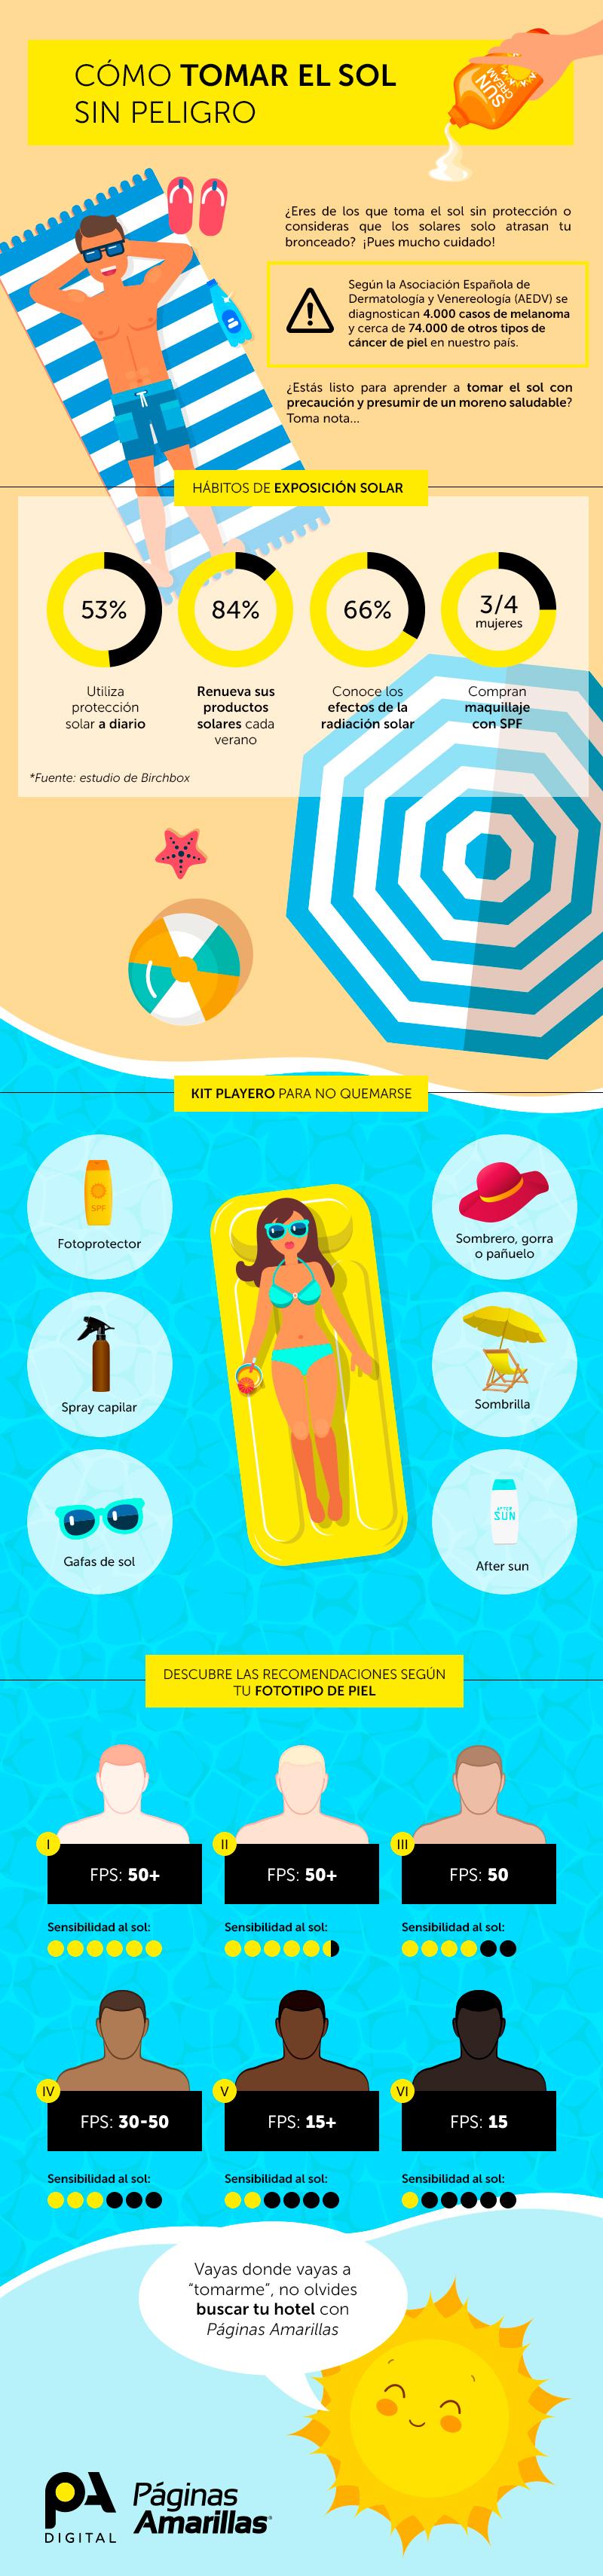 infografia-tomar-sol